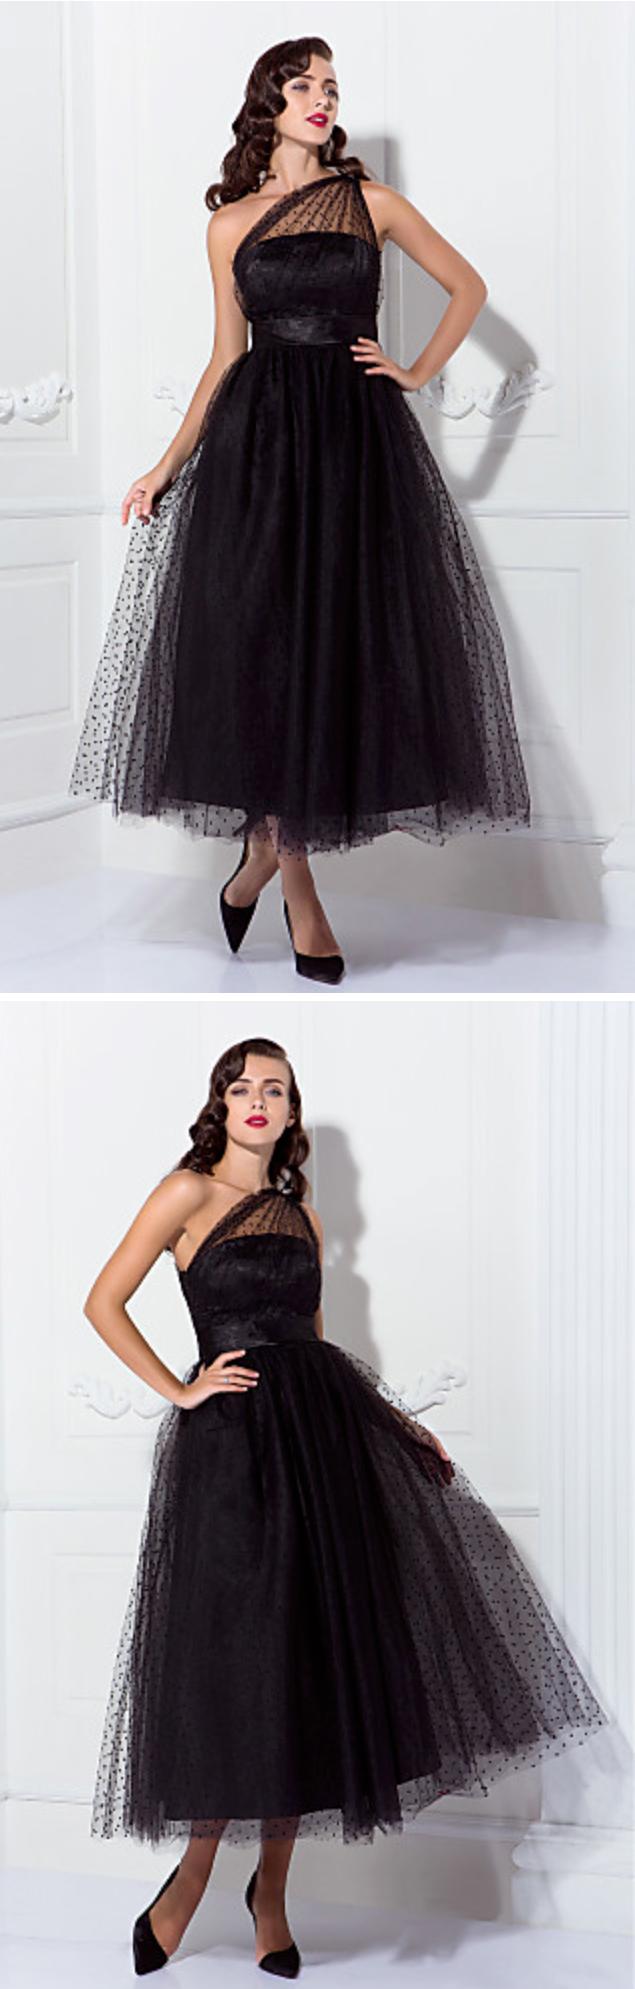 Dresses for 50th wedding anniversary party  Black tulle tea length dress  Glam  Pinterest  Tea length dresses